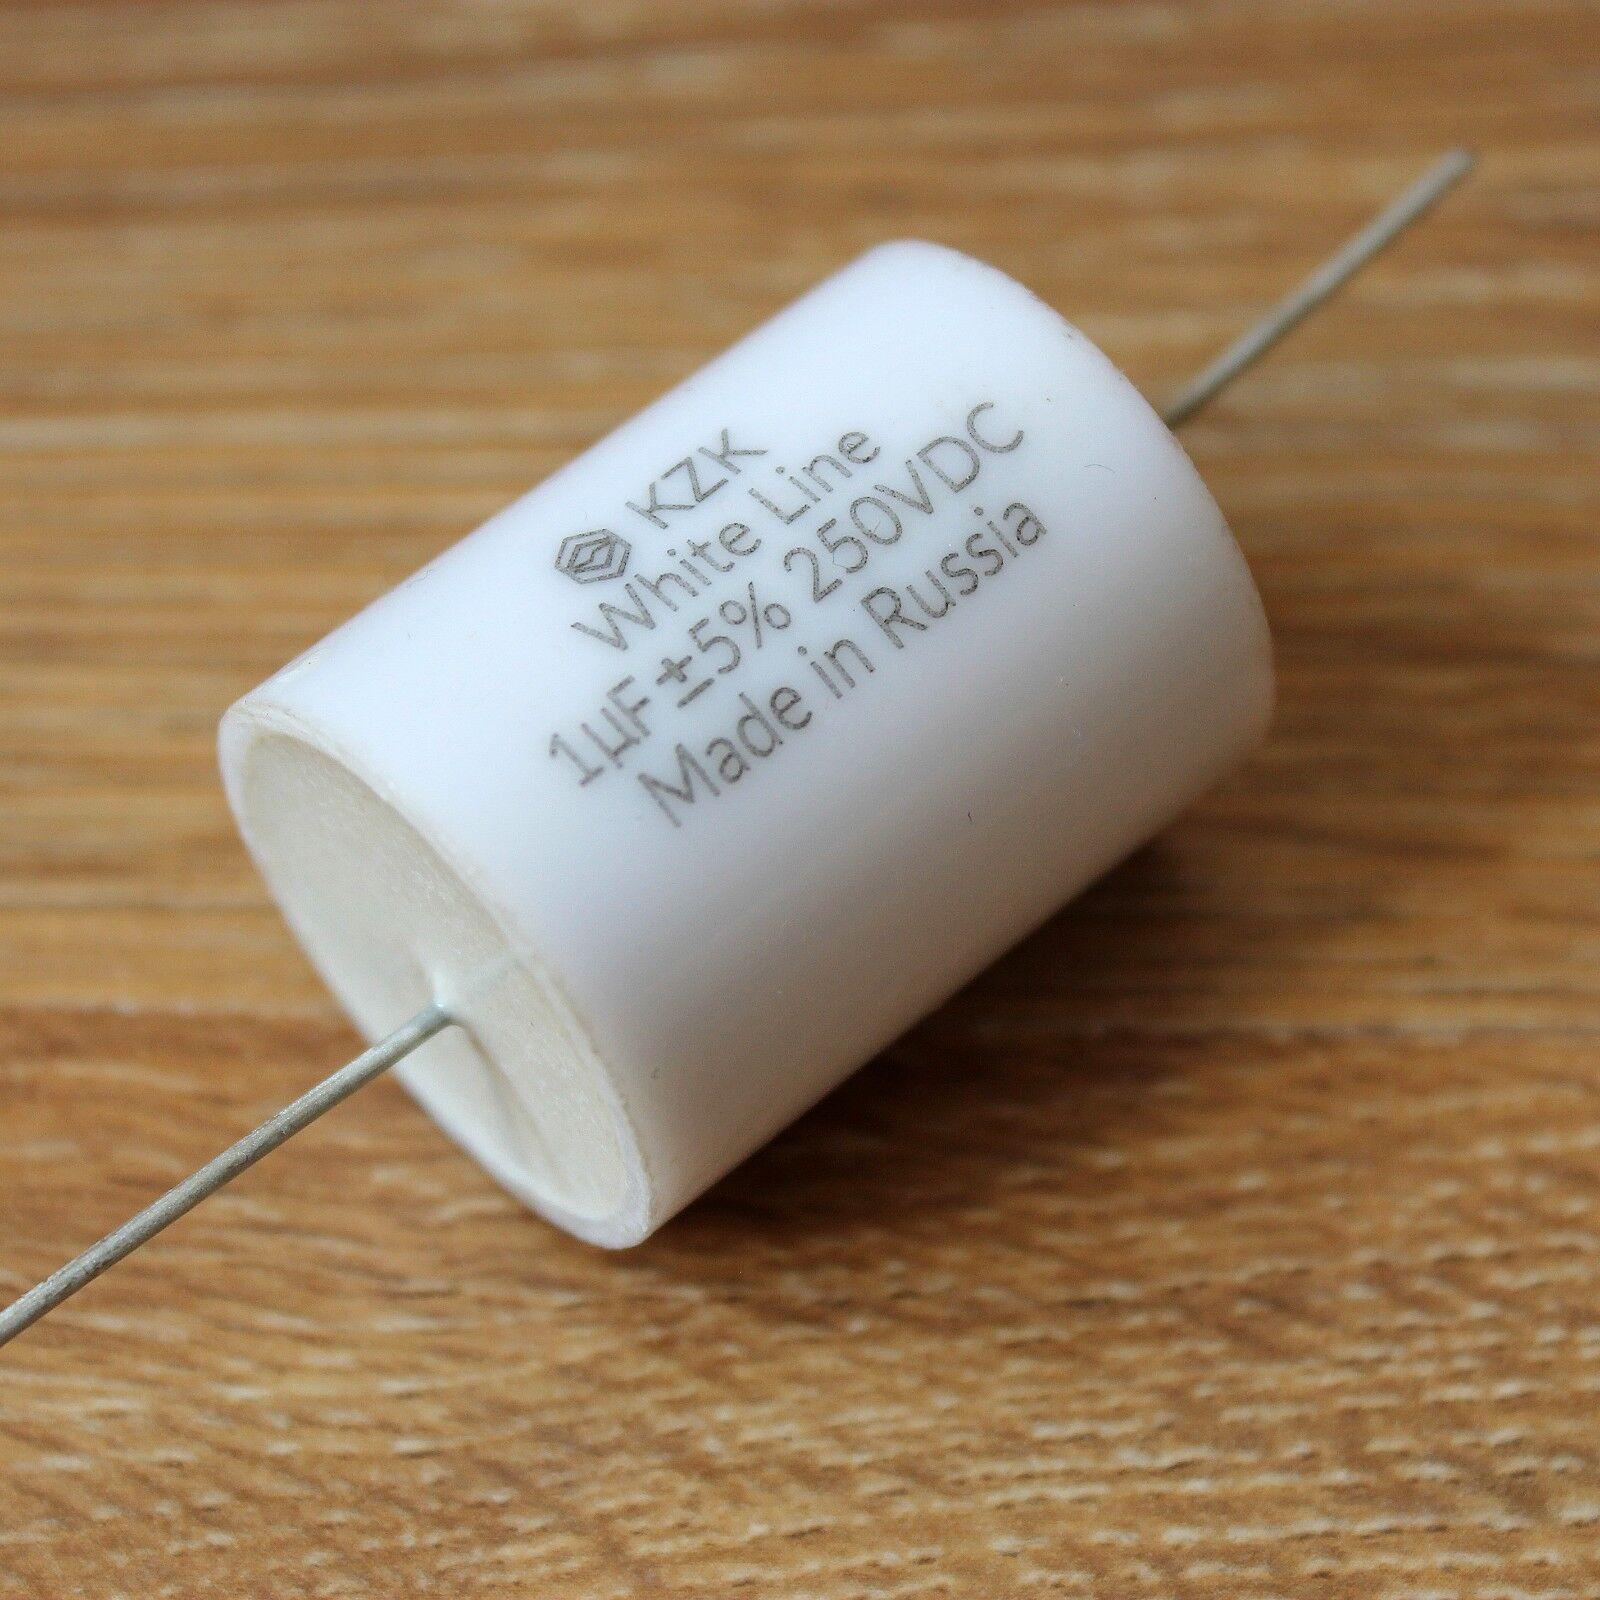 OC Hi-End AUDIO Polystyrene capacitors K71-4 RARE!!! 1uF 250V MATCHED PAIR OS